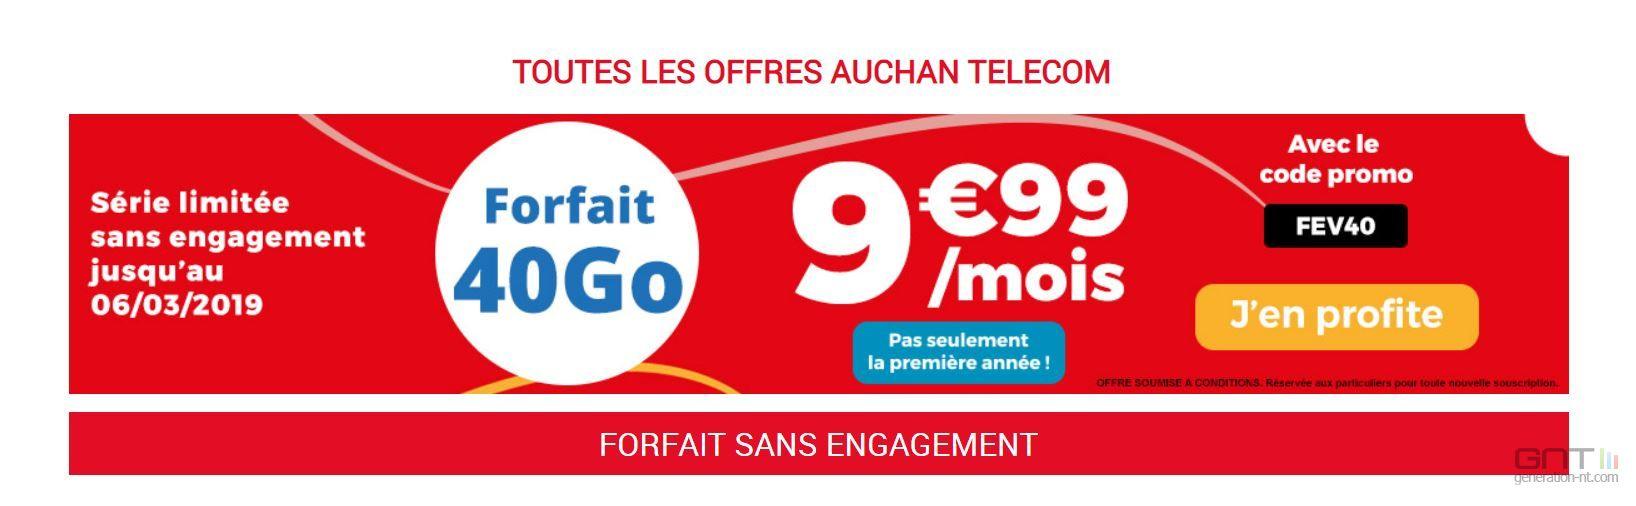 Carte Sim Auchan Telecom.Bon Plan Forfaits Mobiles Auchan Telecom B You Free